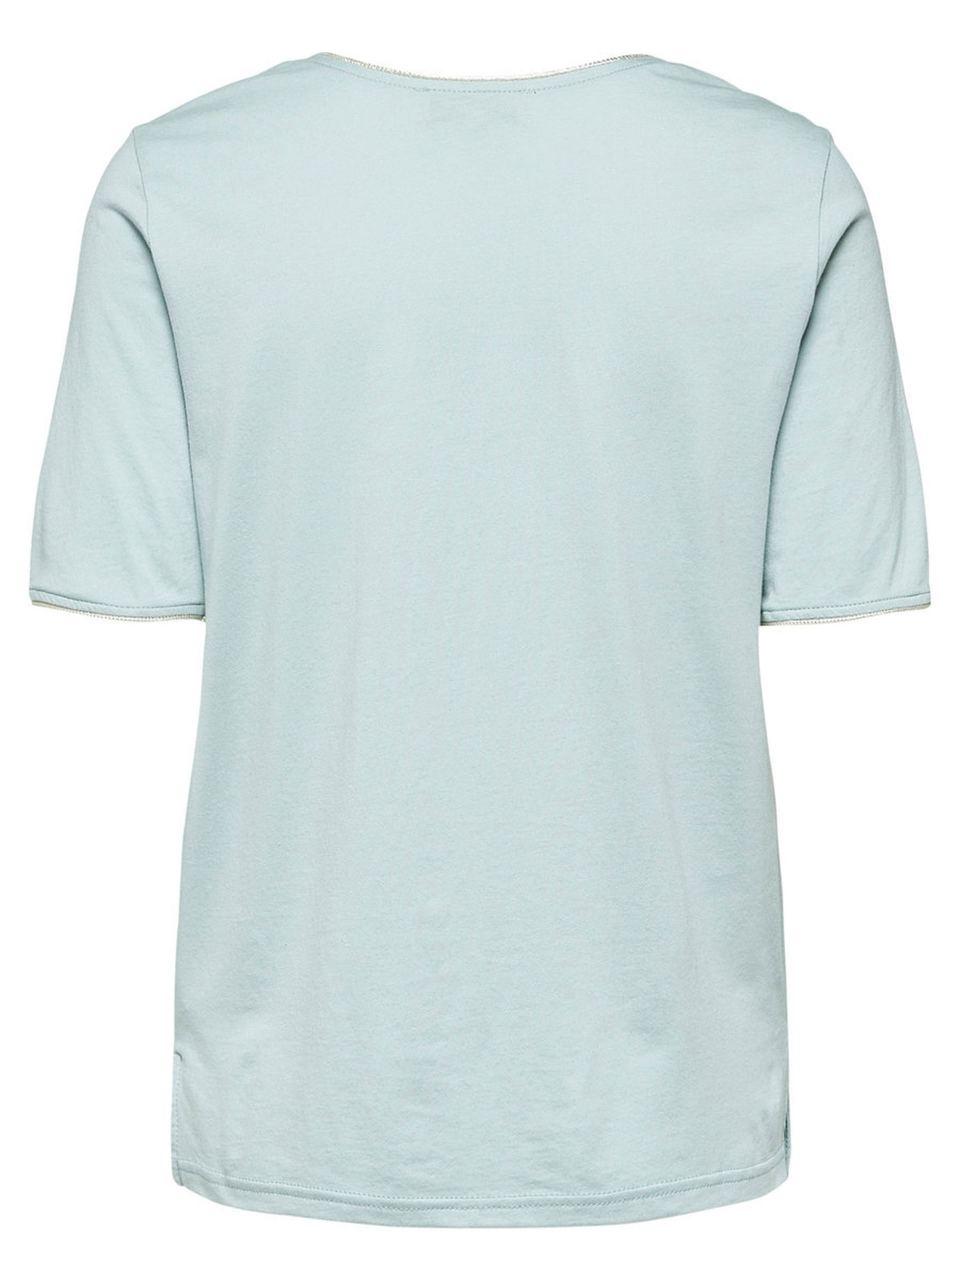 SLFLUCY T-Shirt Gray Mist